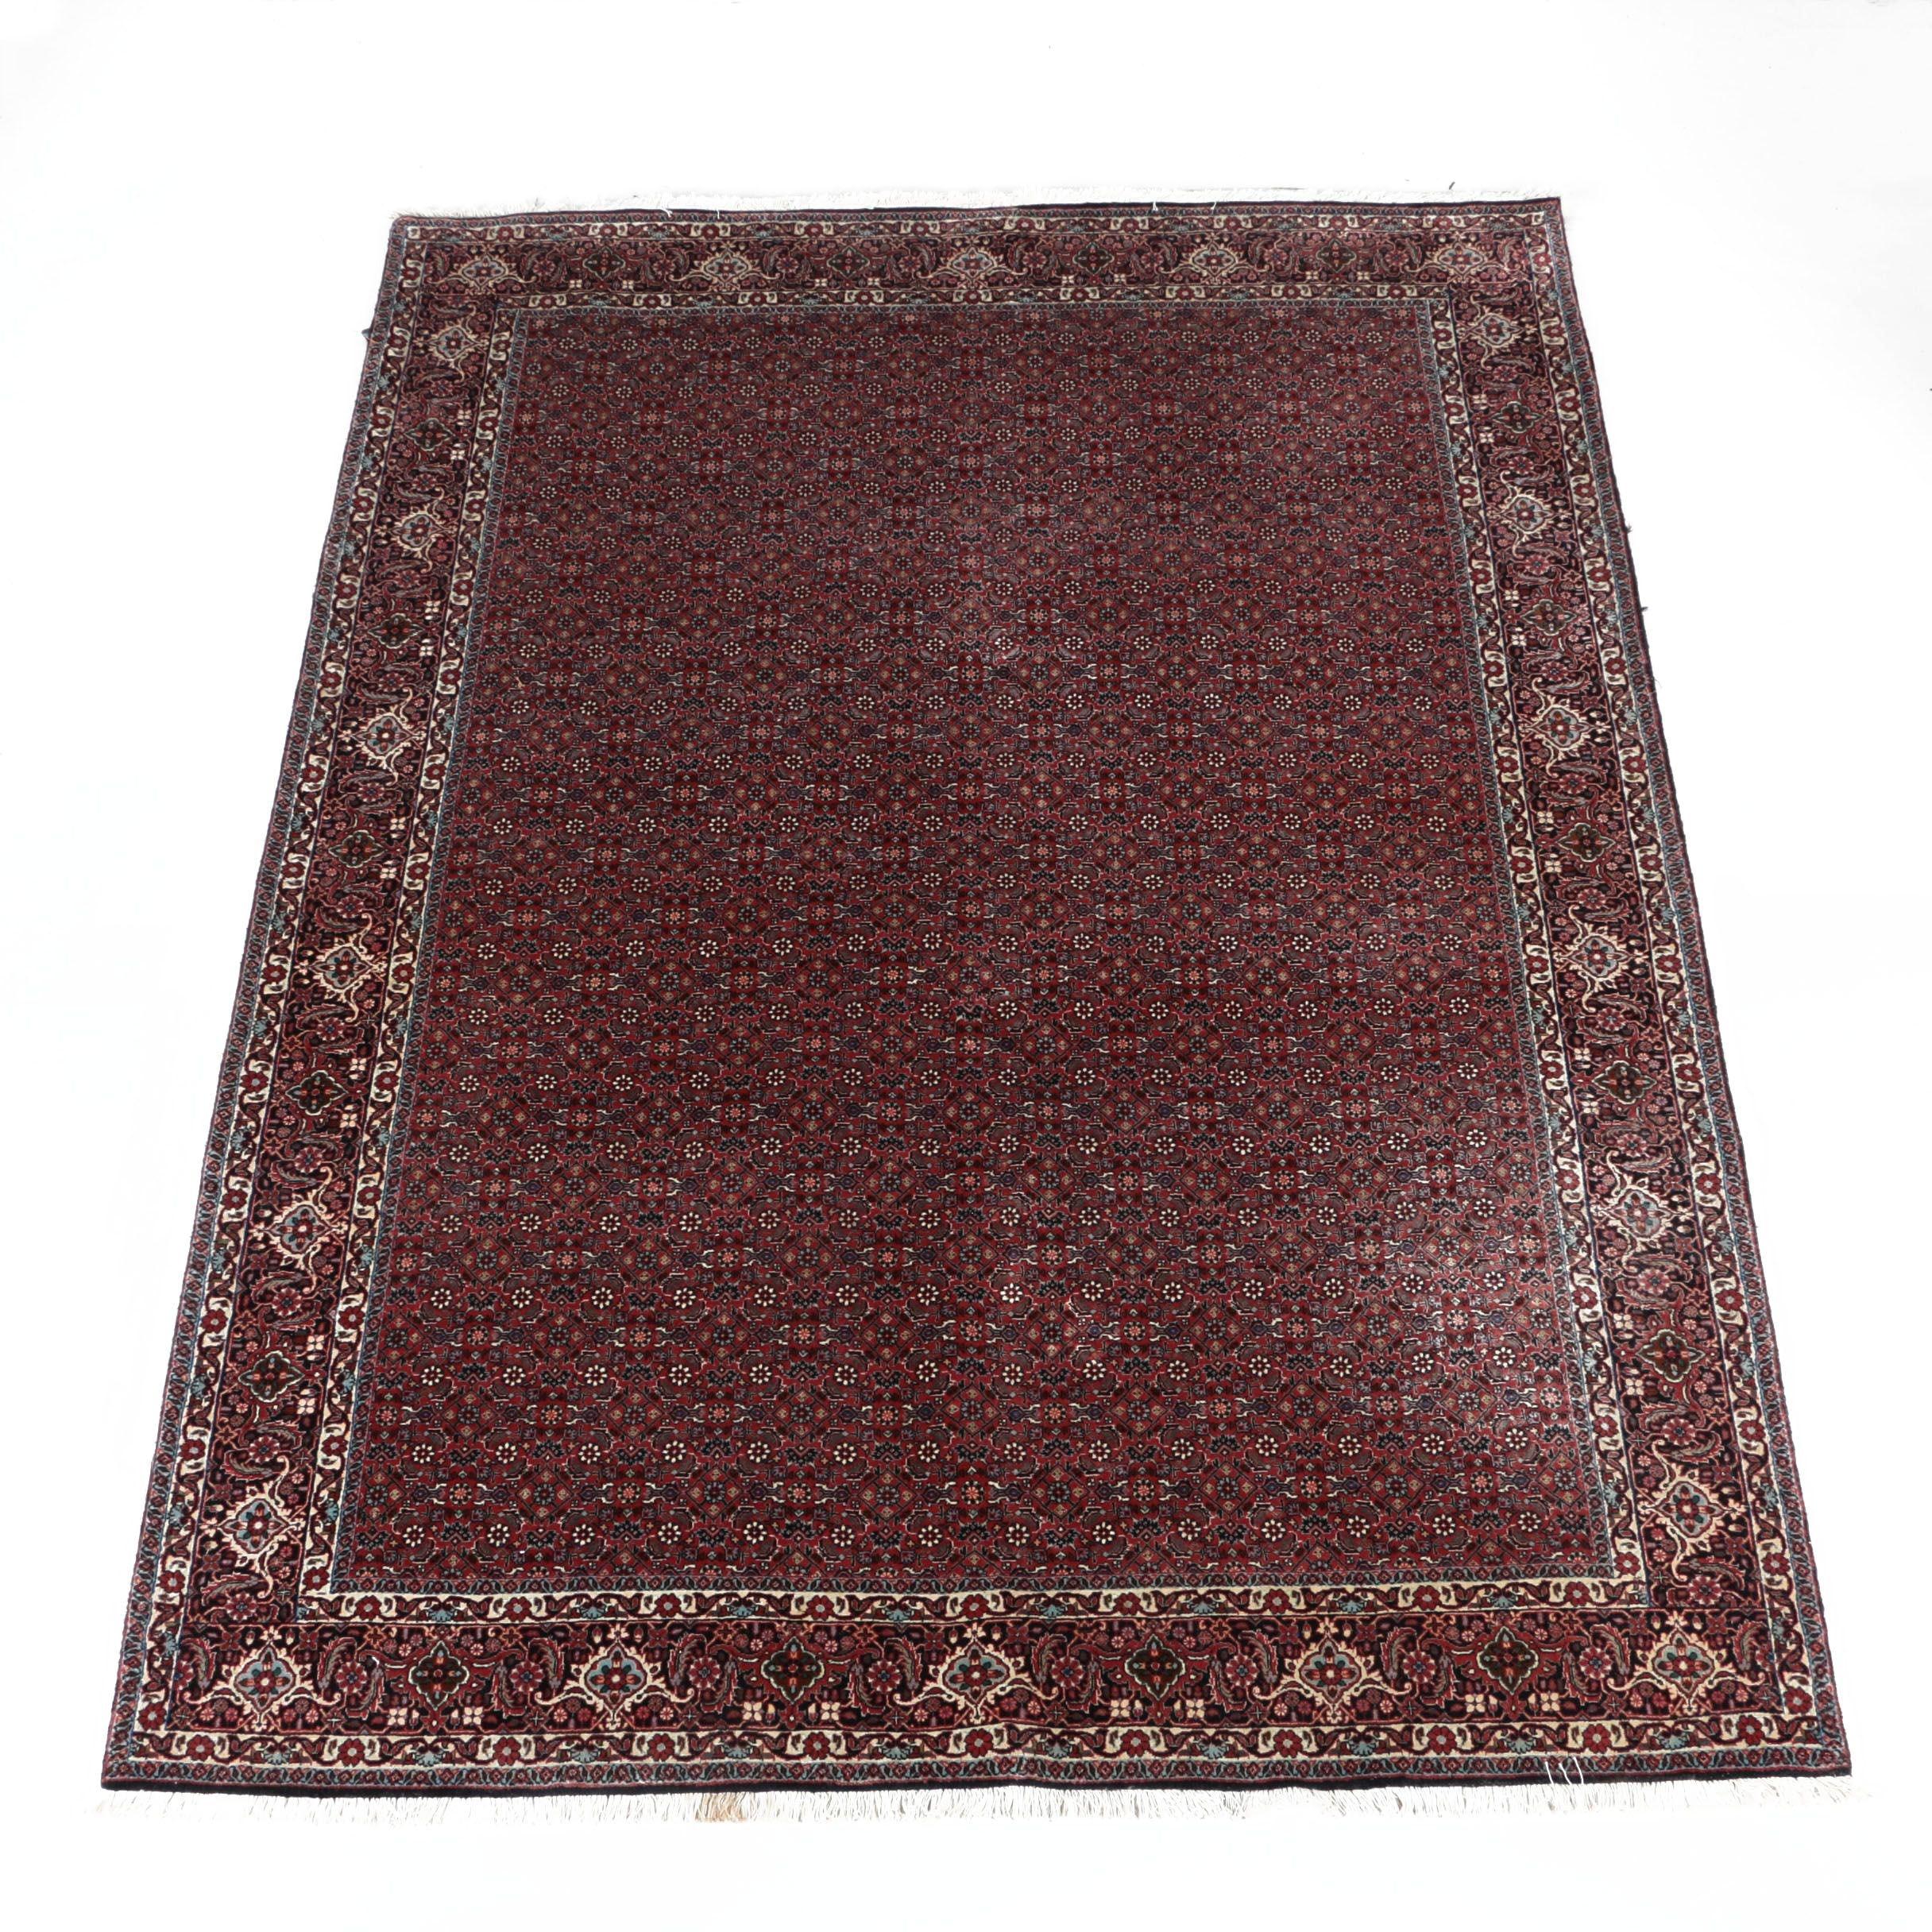 Hand-Knotted Persian Bijar Area Rug